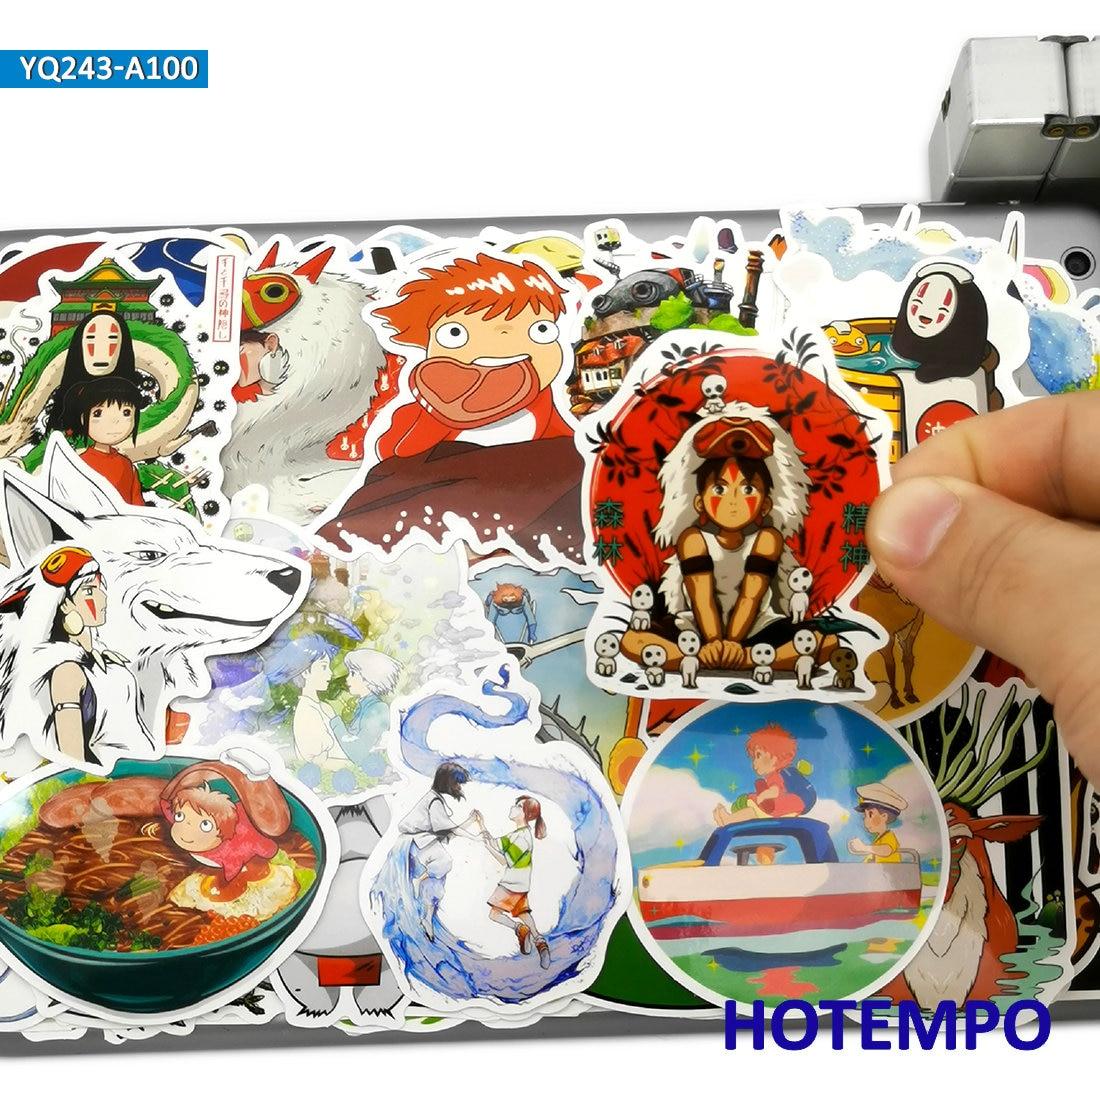 100pcs Manga Miyazaki Hayao Classic Anime Movie Stickers Toys for Kids Mobile Phone Laptop Luggage Skateboard Art Decal Stickers(China)